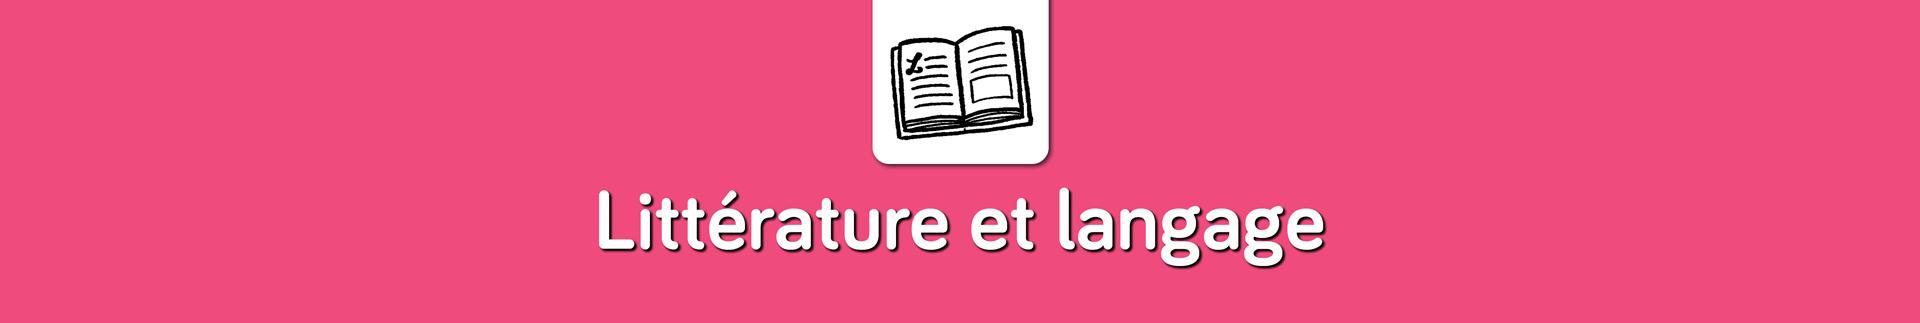 Bannieres_Litterature desktop